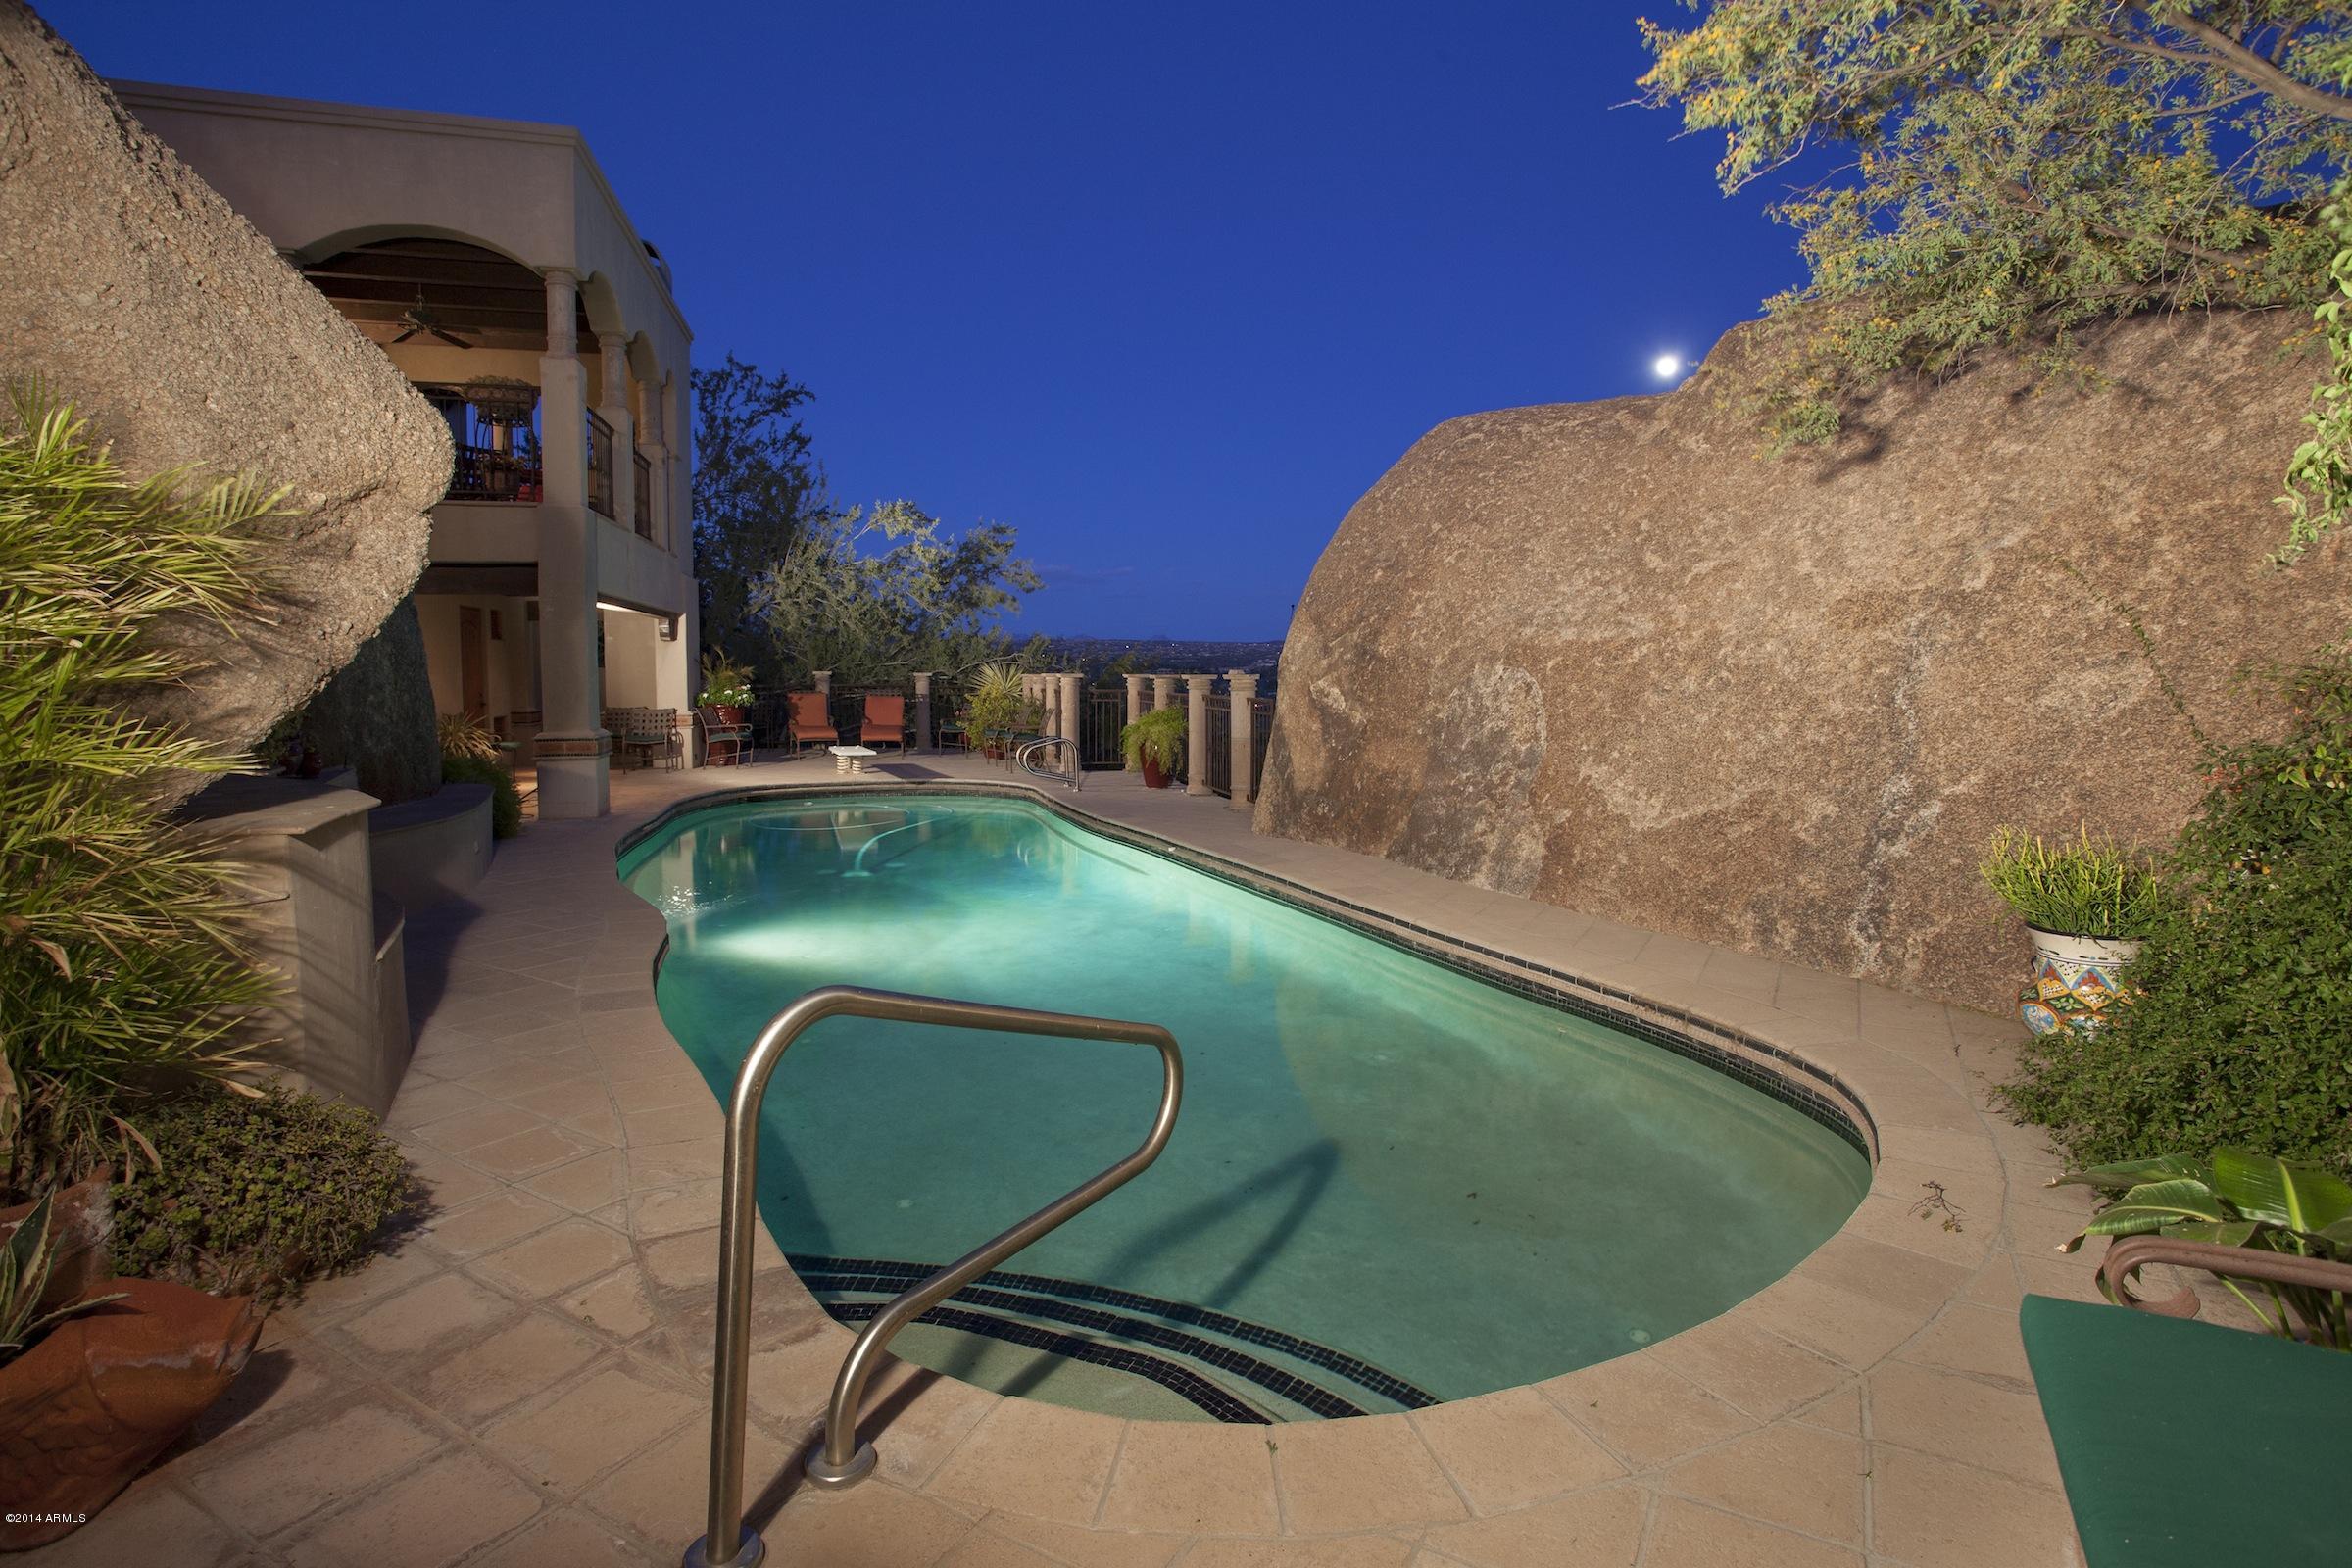 MLS 5714877 6980 E STAGECOACH Pass, Carefree, AZ 85377 Carefree AZ Three Bedroom